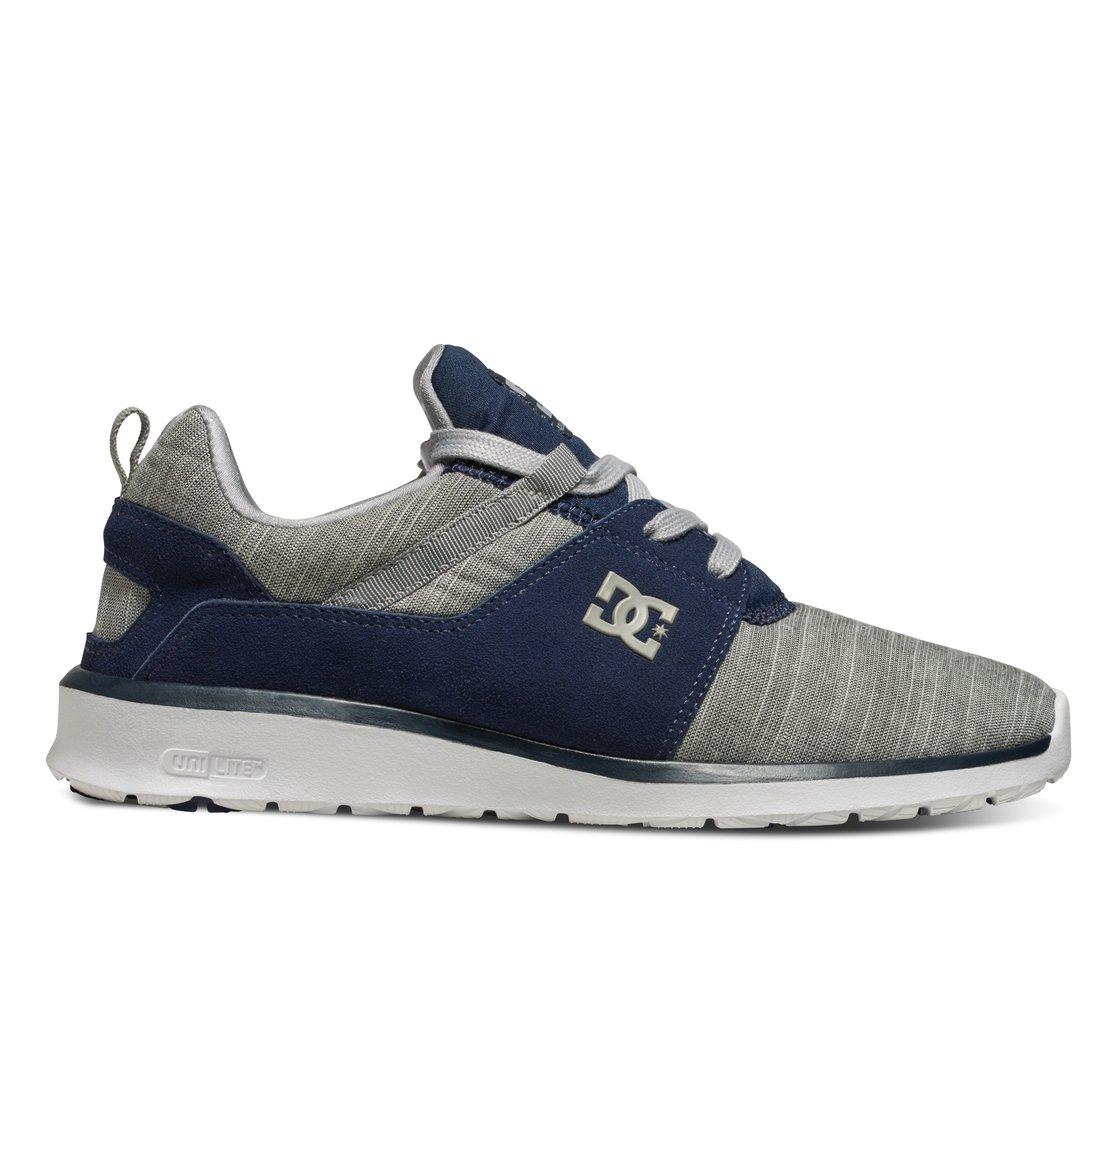 dc shoes heathrow se low top shoes for men adys700073 ebay. Black Bedroom Furniture Sets. Home Design Ideas